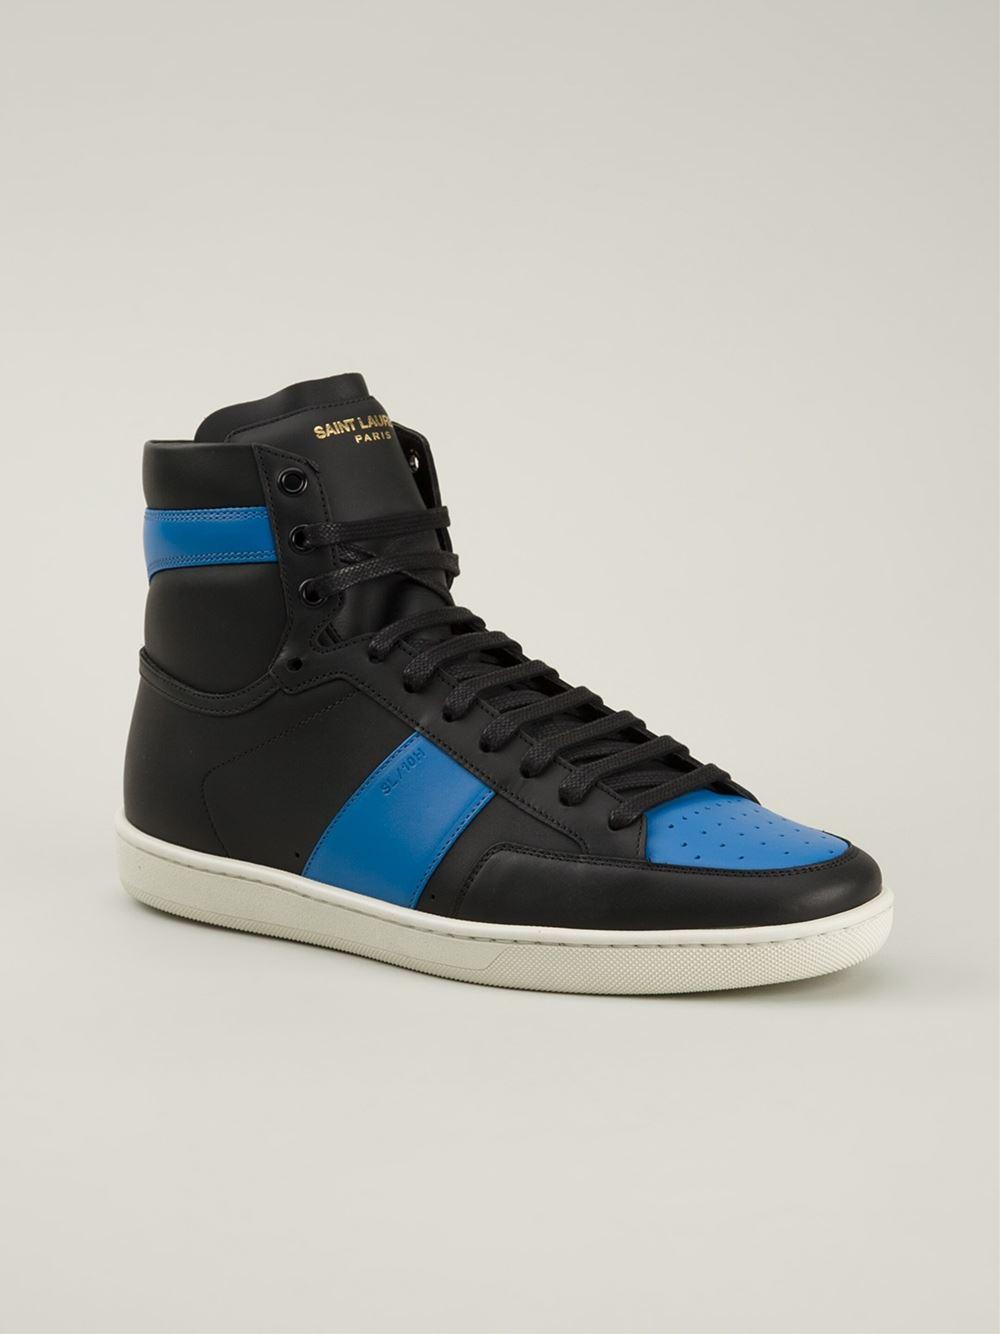 Saint laurent 'court Classic' Sneakers in Black for Men | Lyst